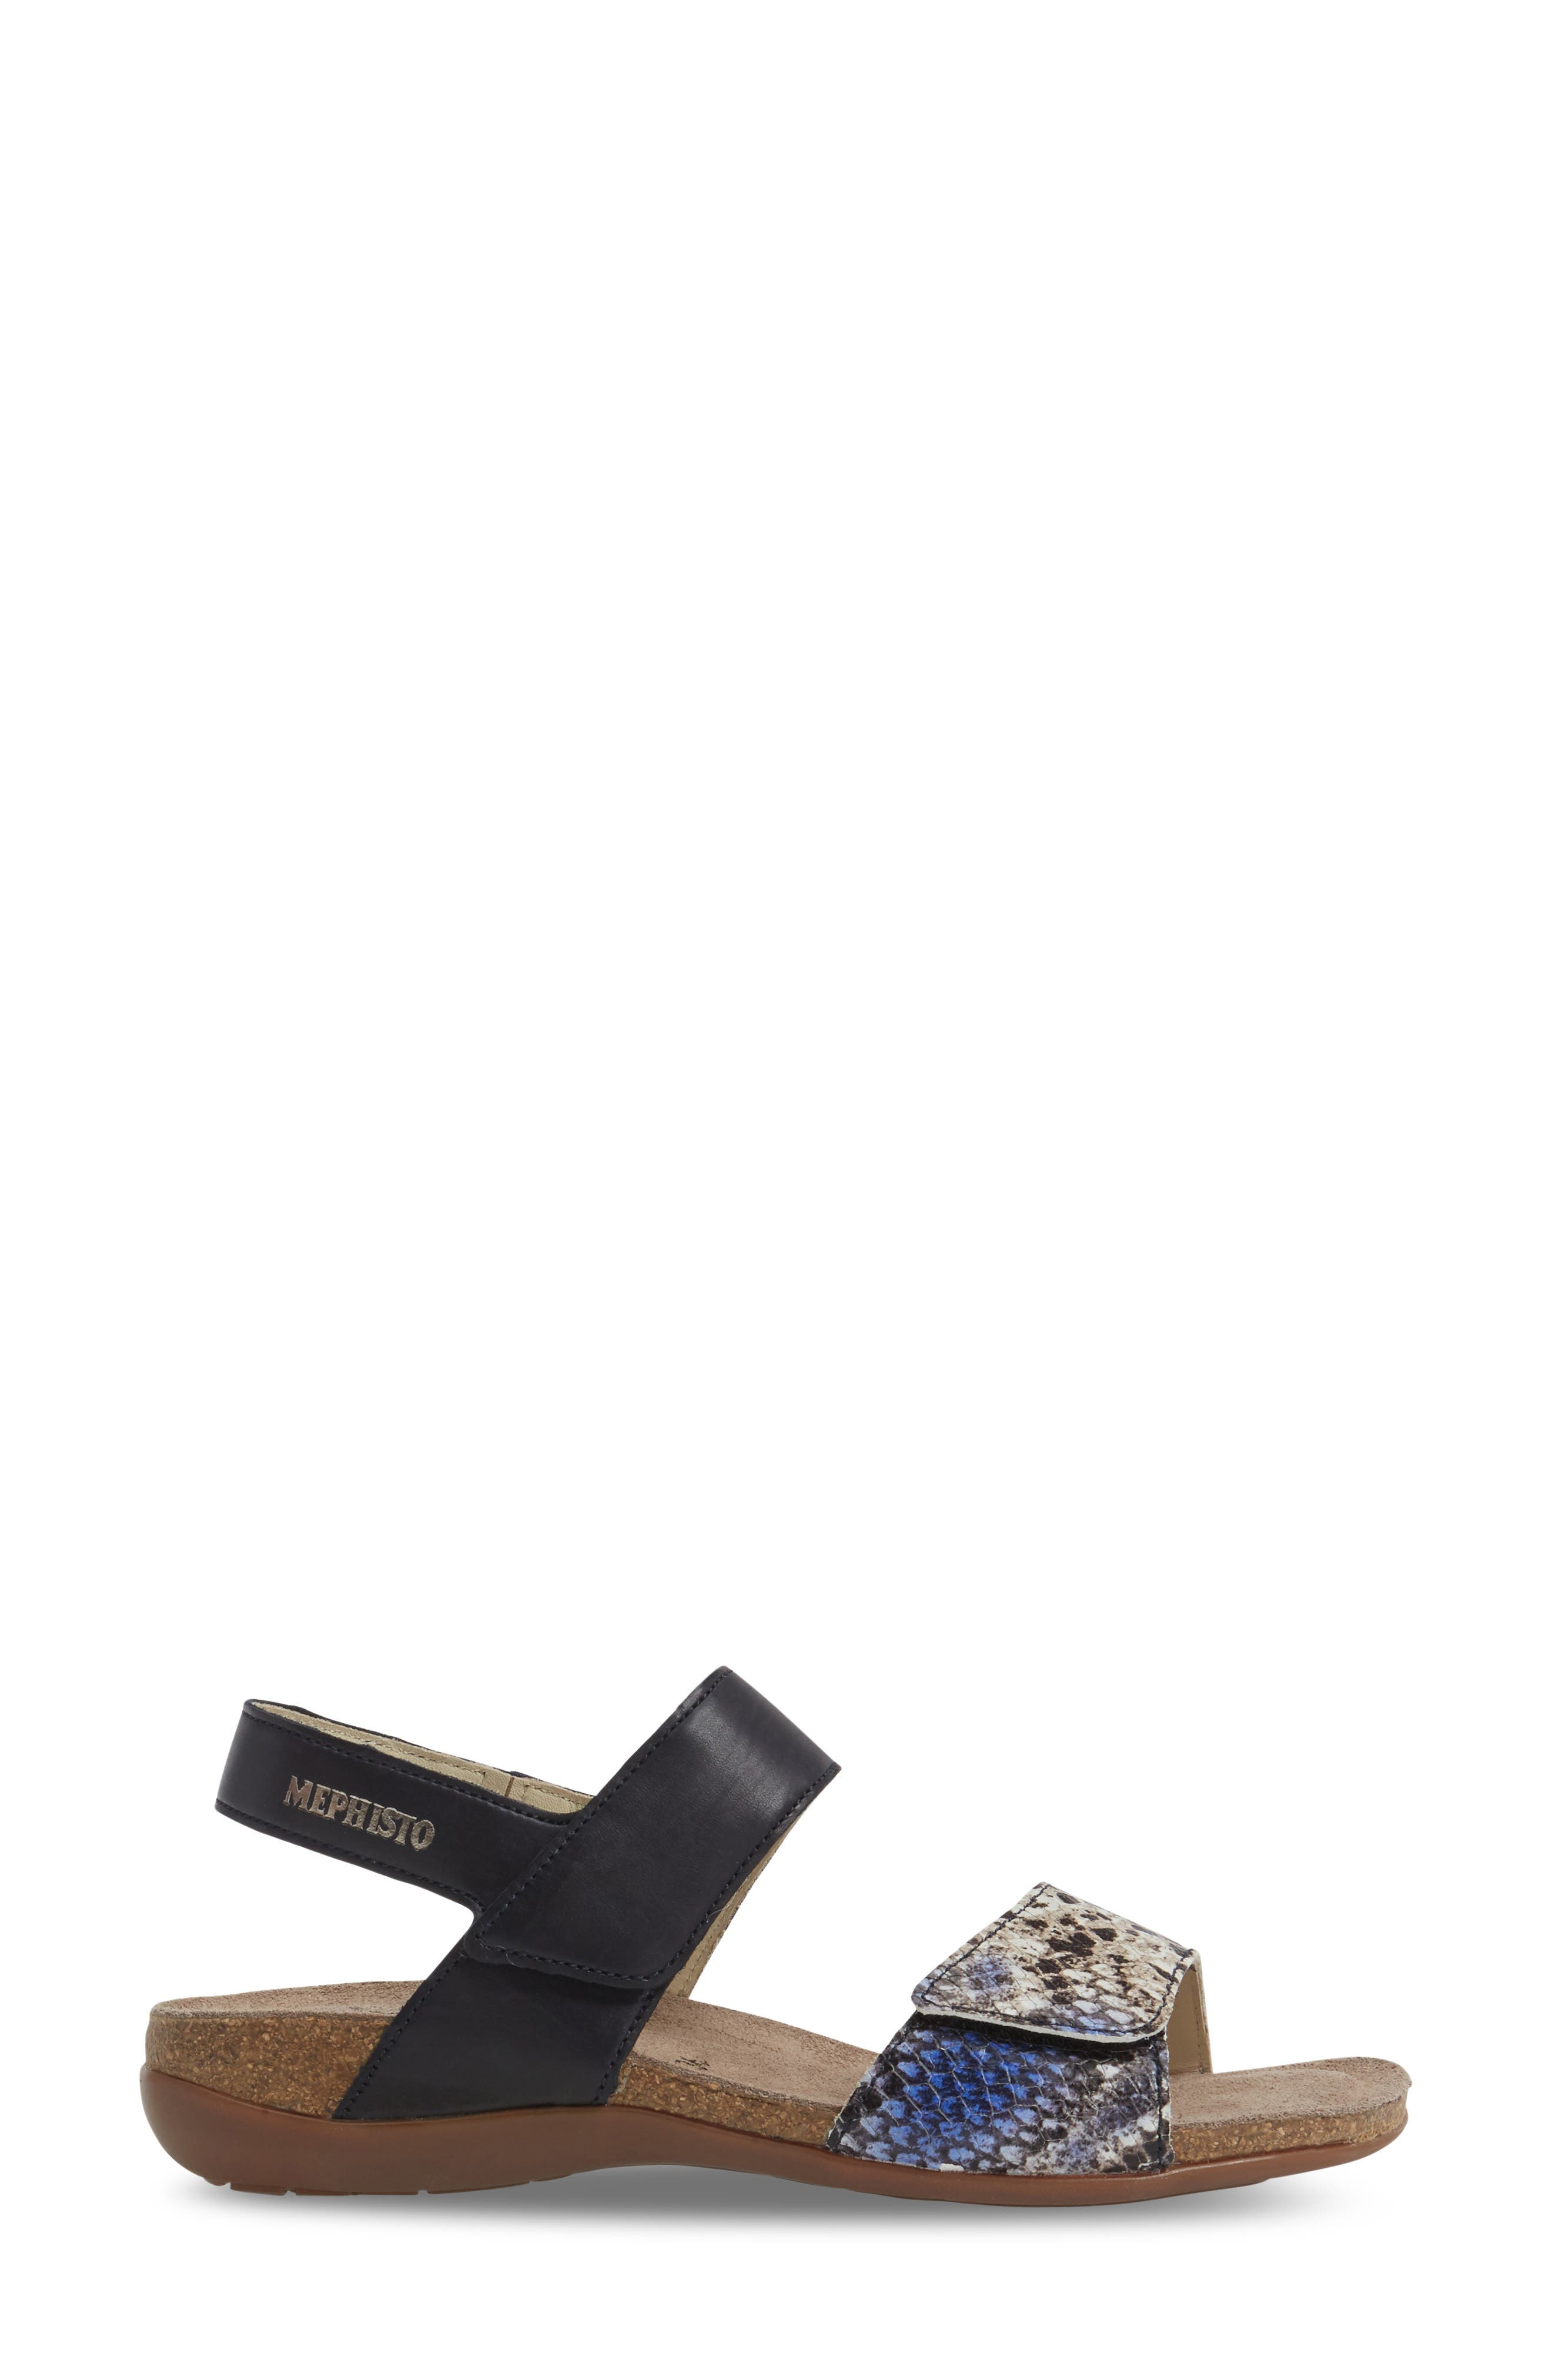 Alternate Image 3  - Mephisto 'Agave' Sandal